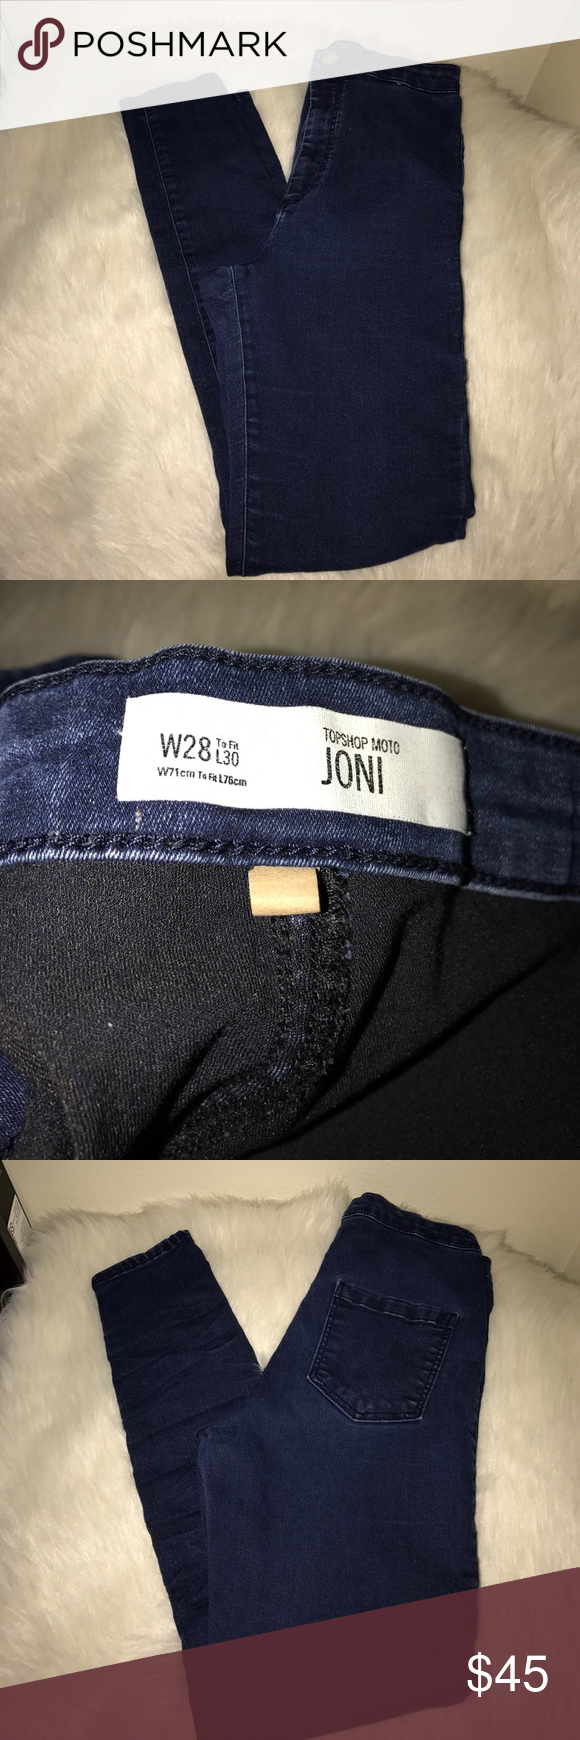 Topshop Topshop Joni Jeans. Dark denim. W 28 L 30. Used - in good condition. Topshop Pants Skinny